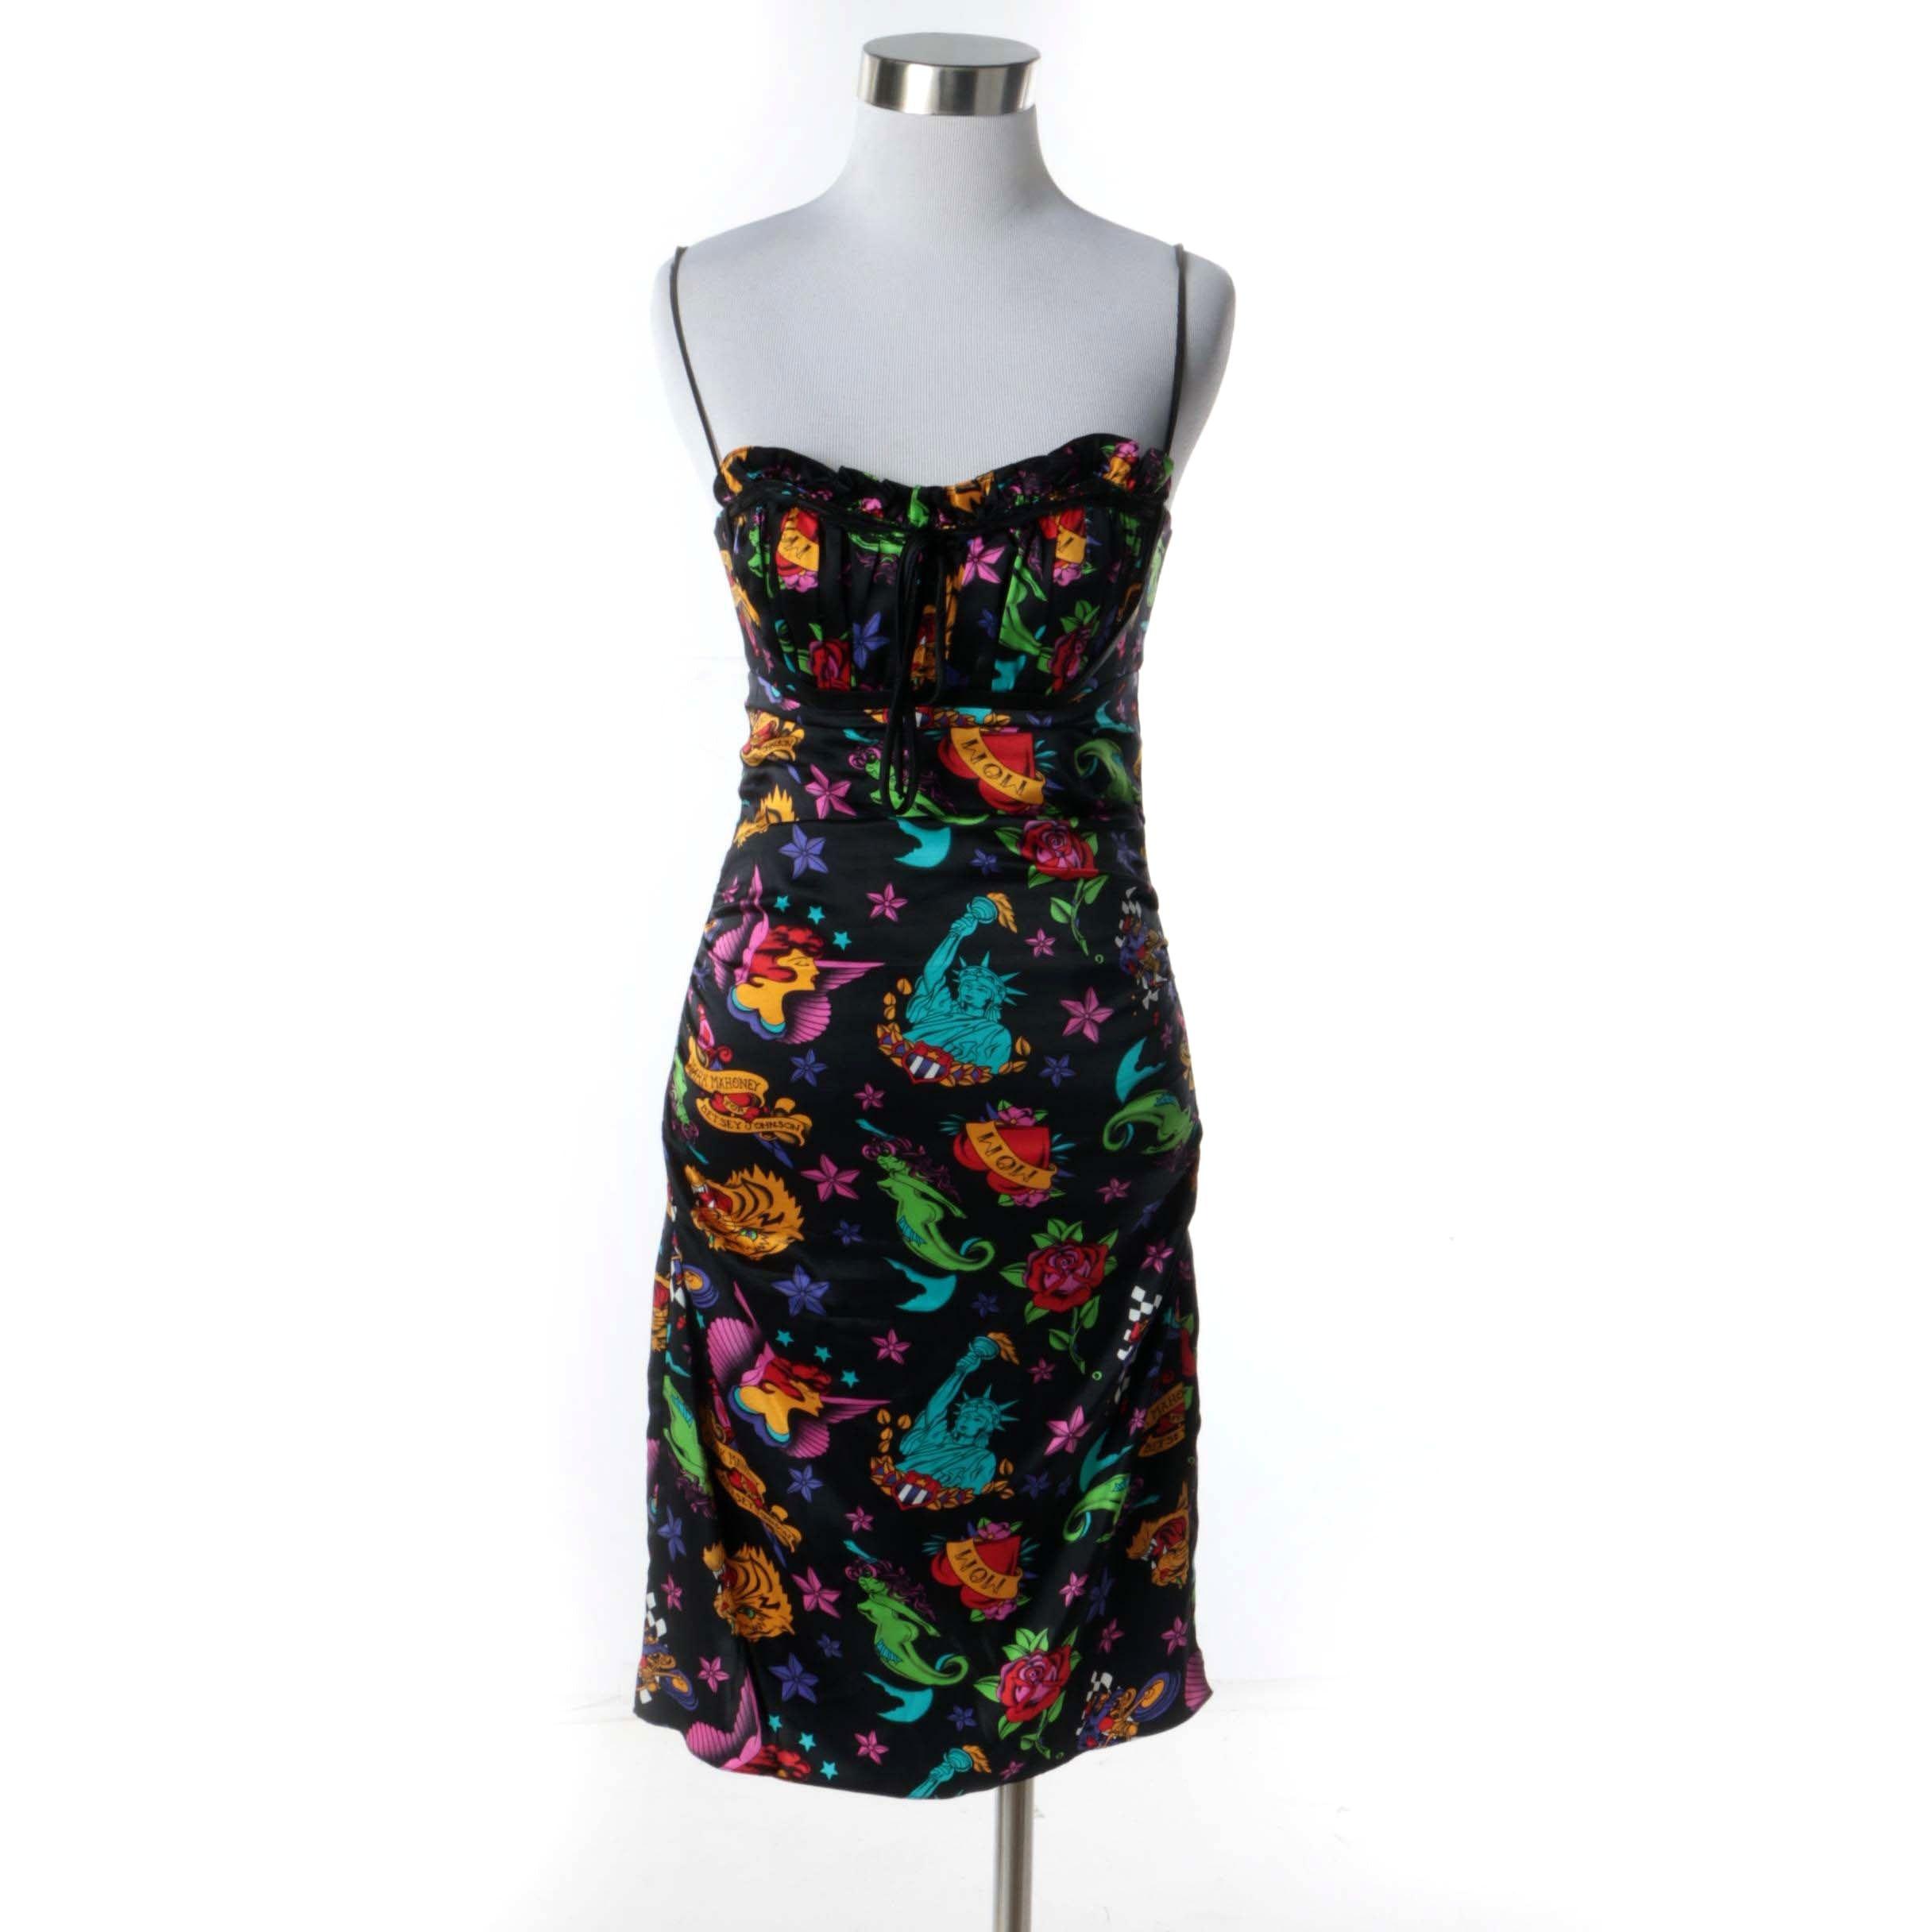 Mark Mahoney for Betsey Johnson Silk Tattoo Print Sleeveless Cocktail Dress